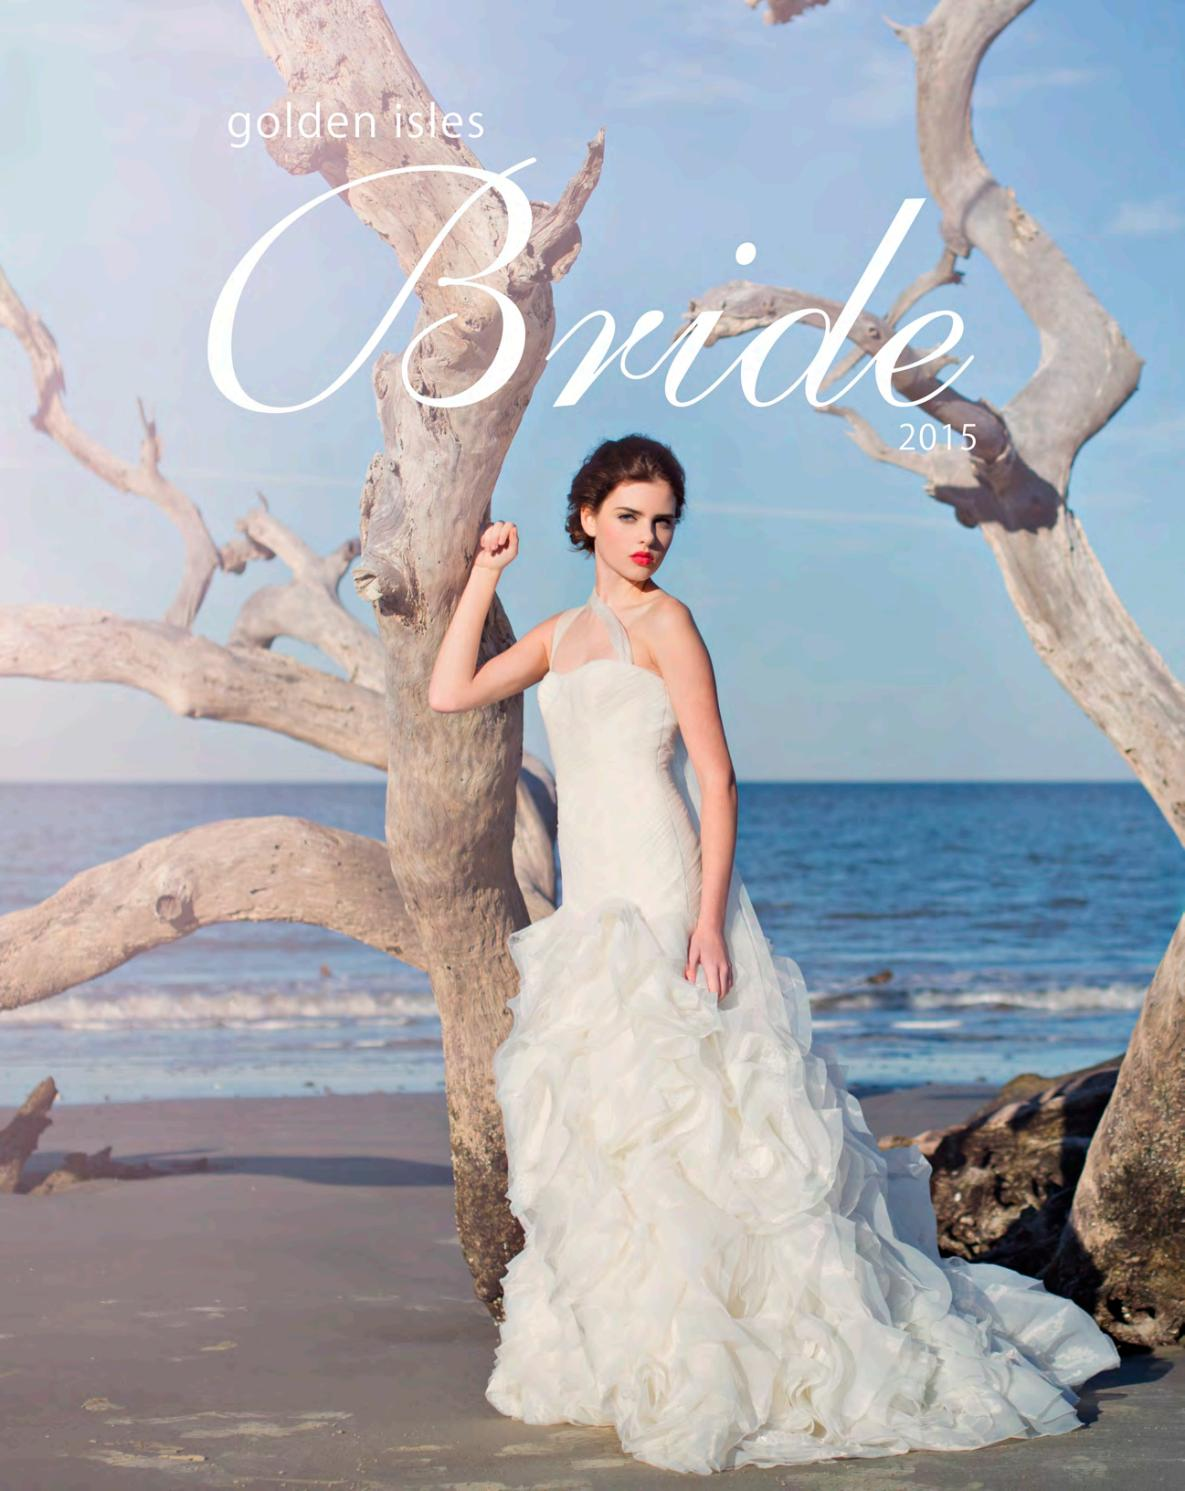 Golden Isles Bride 2015 by goldenislesbride - issuu